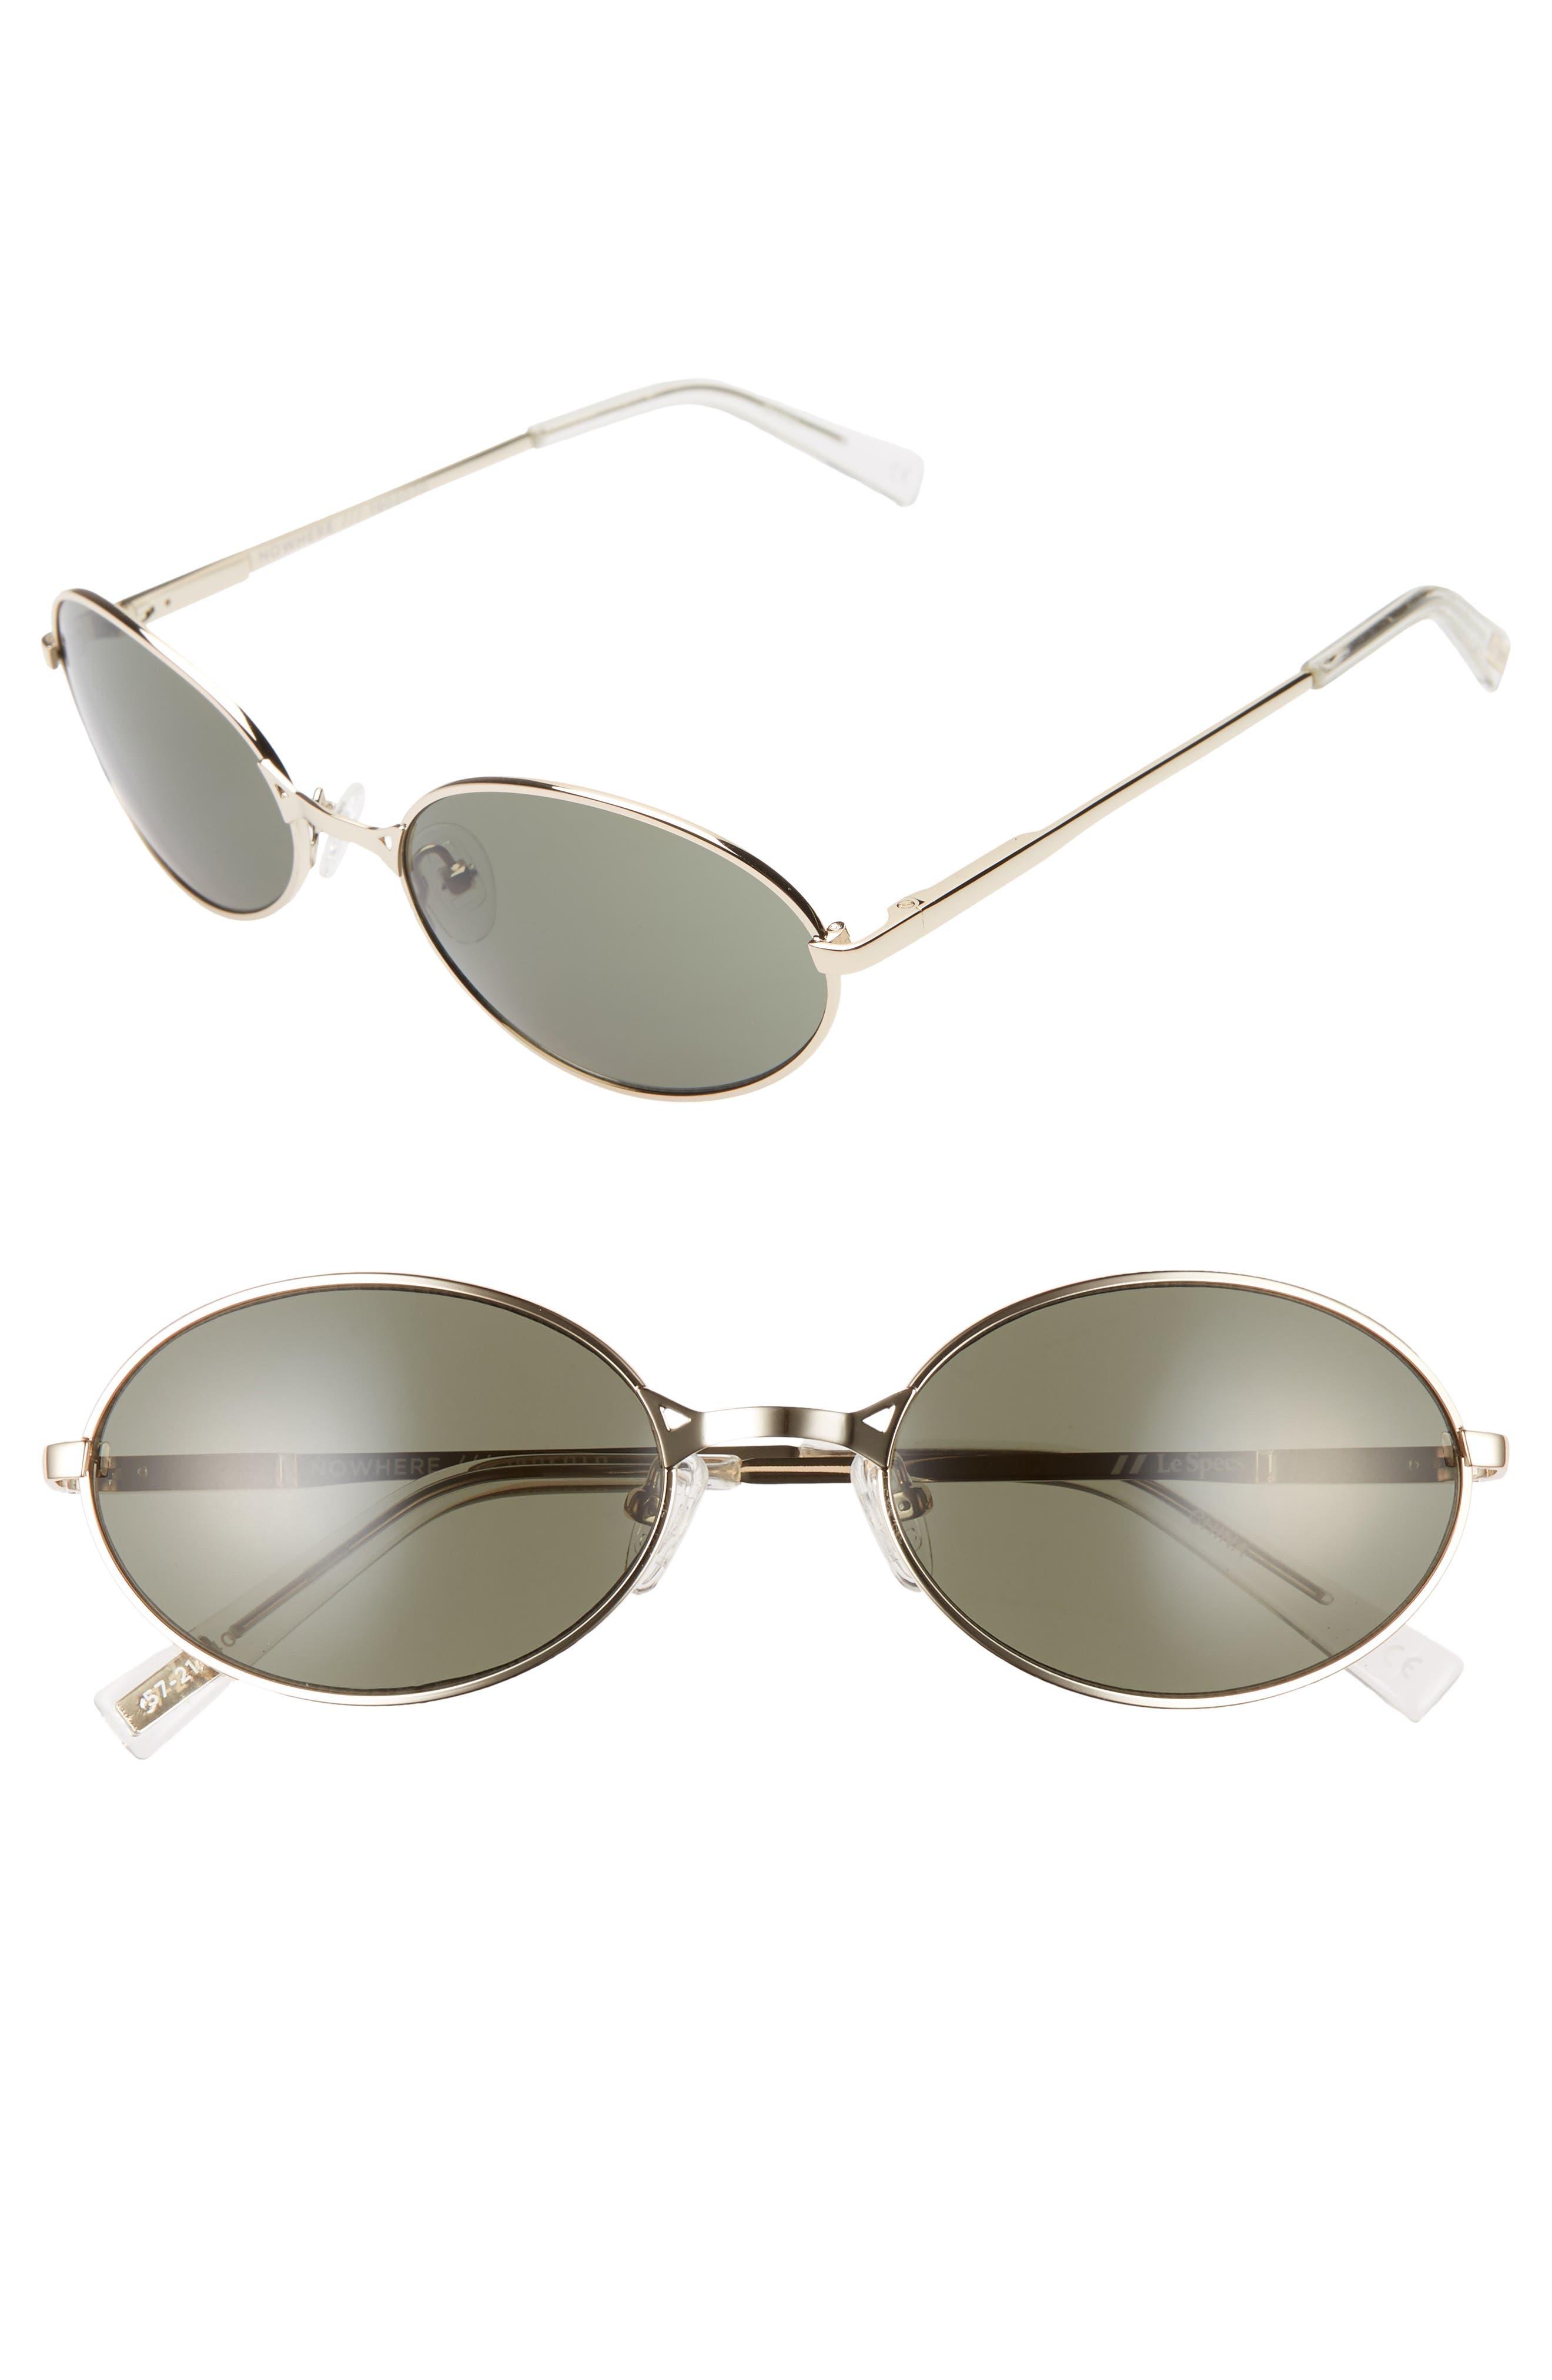 Le Specs Nowhere Rund 57Mm Oval Sunglasses - Gold/ Khaki